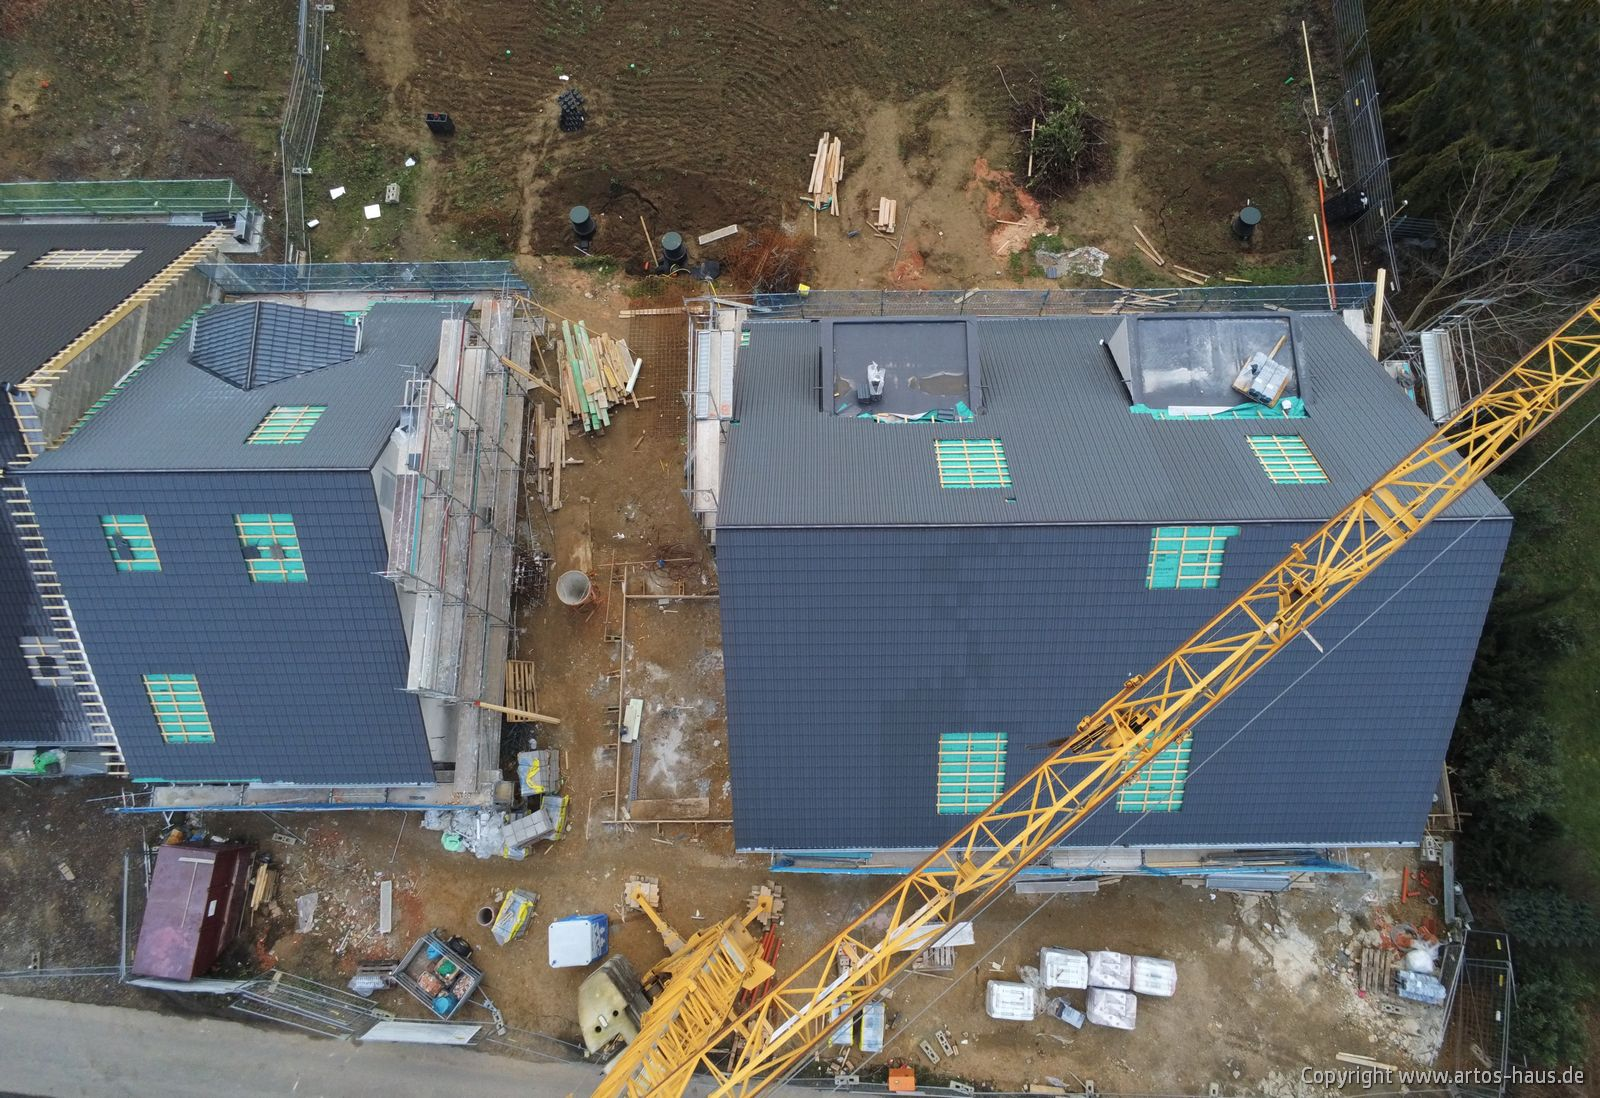 Luftbild Baustelle Hürth Januar 2021 / ARTOS-HAUS Bauvorhaben, Bild 1